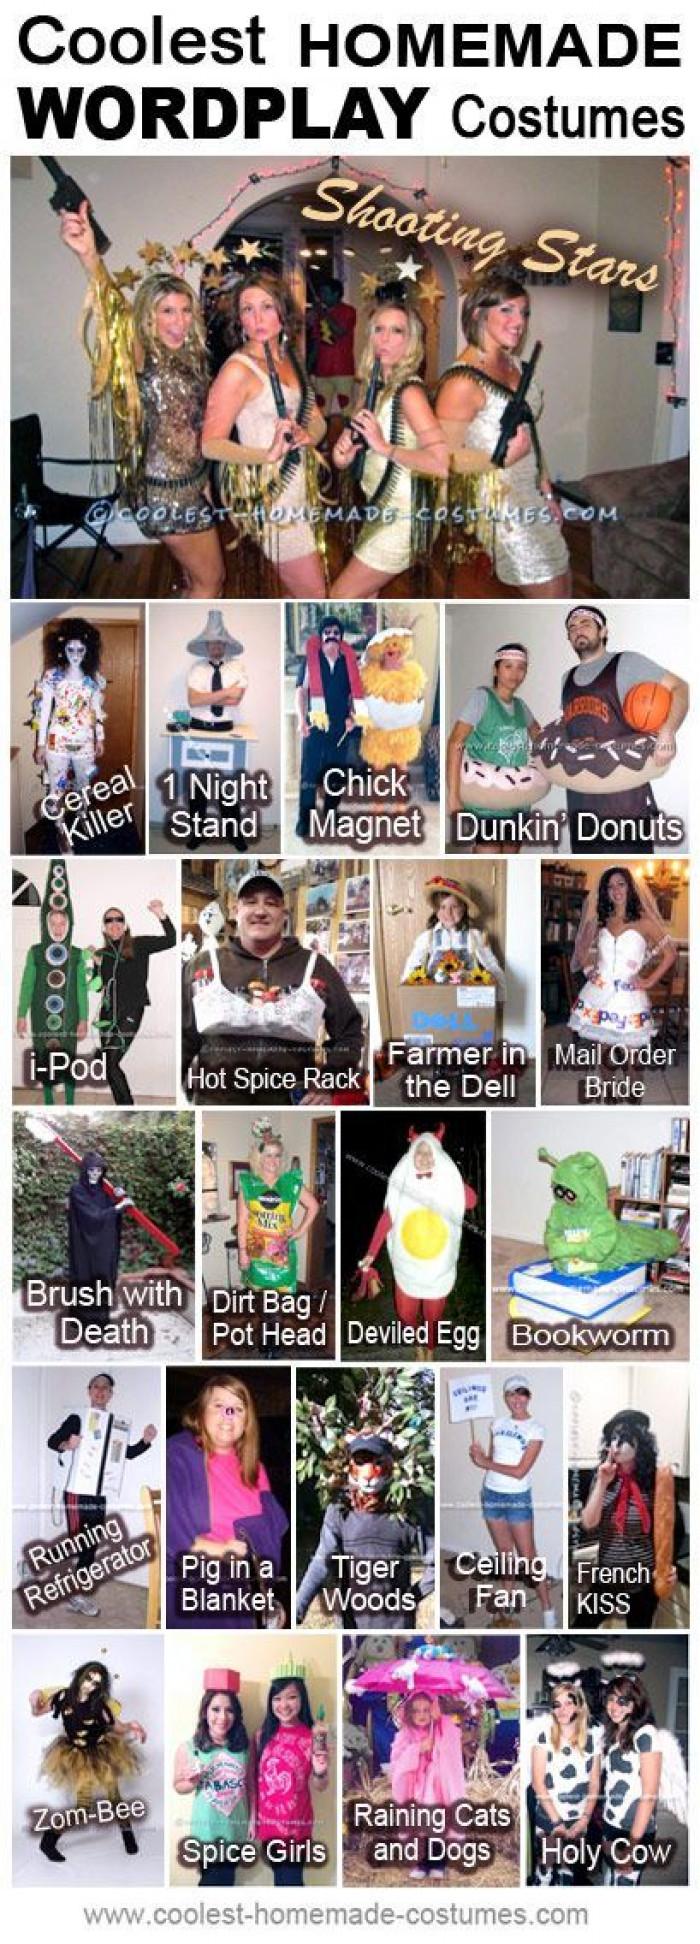 Coolest Homemade Wordplay Costumes